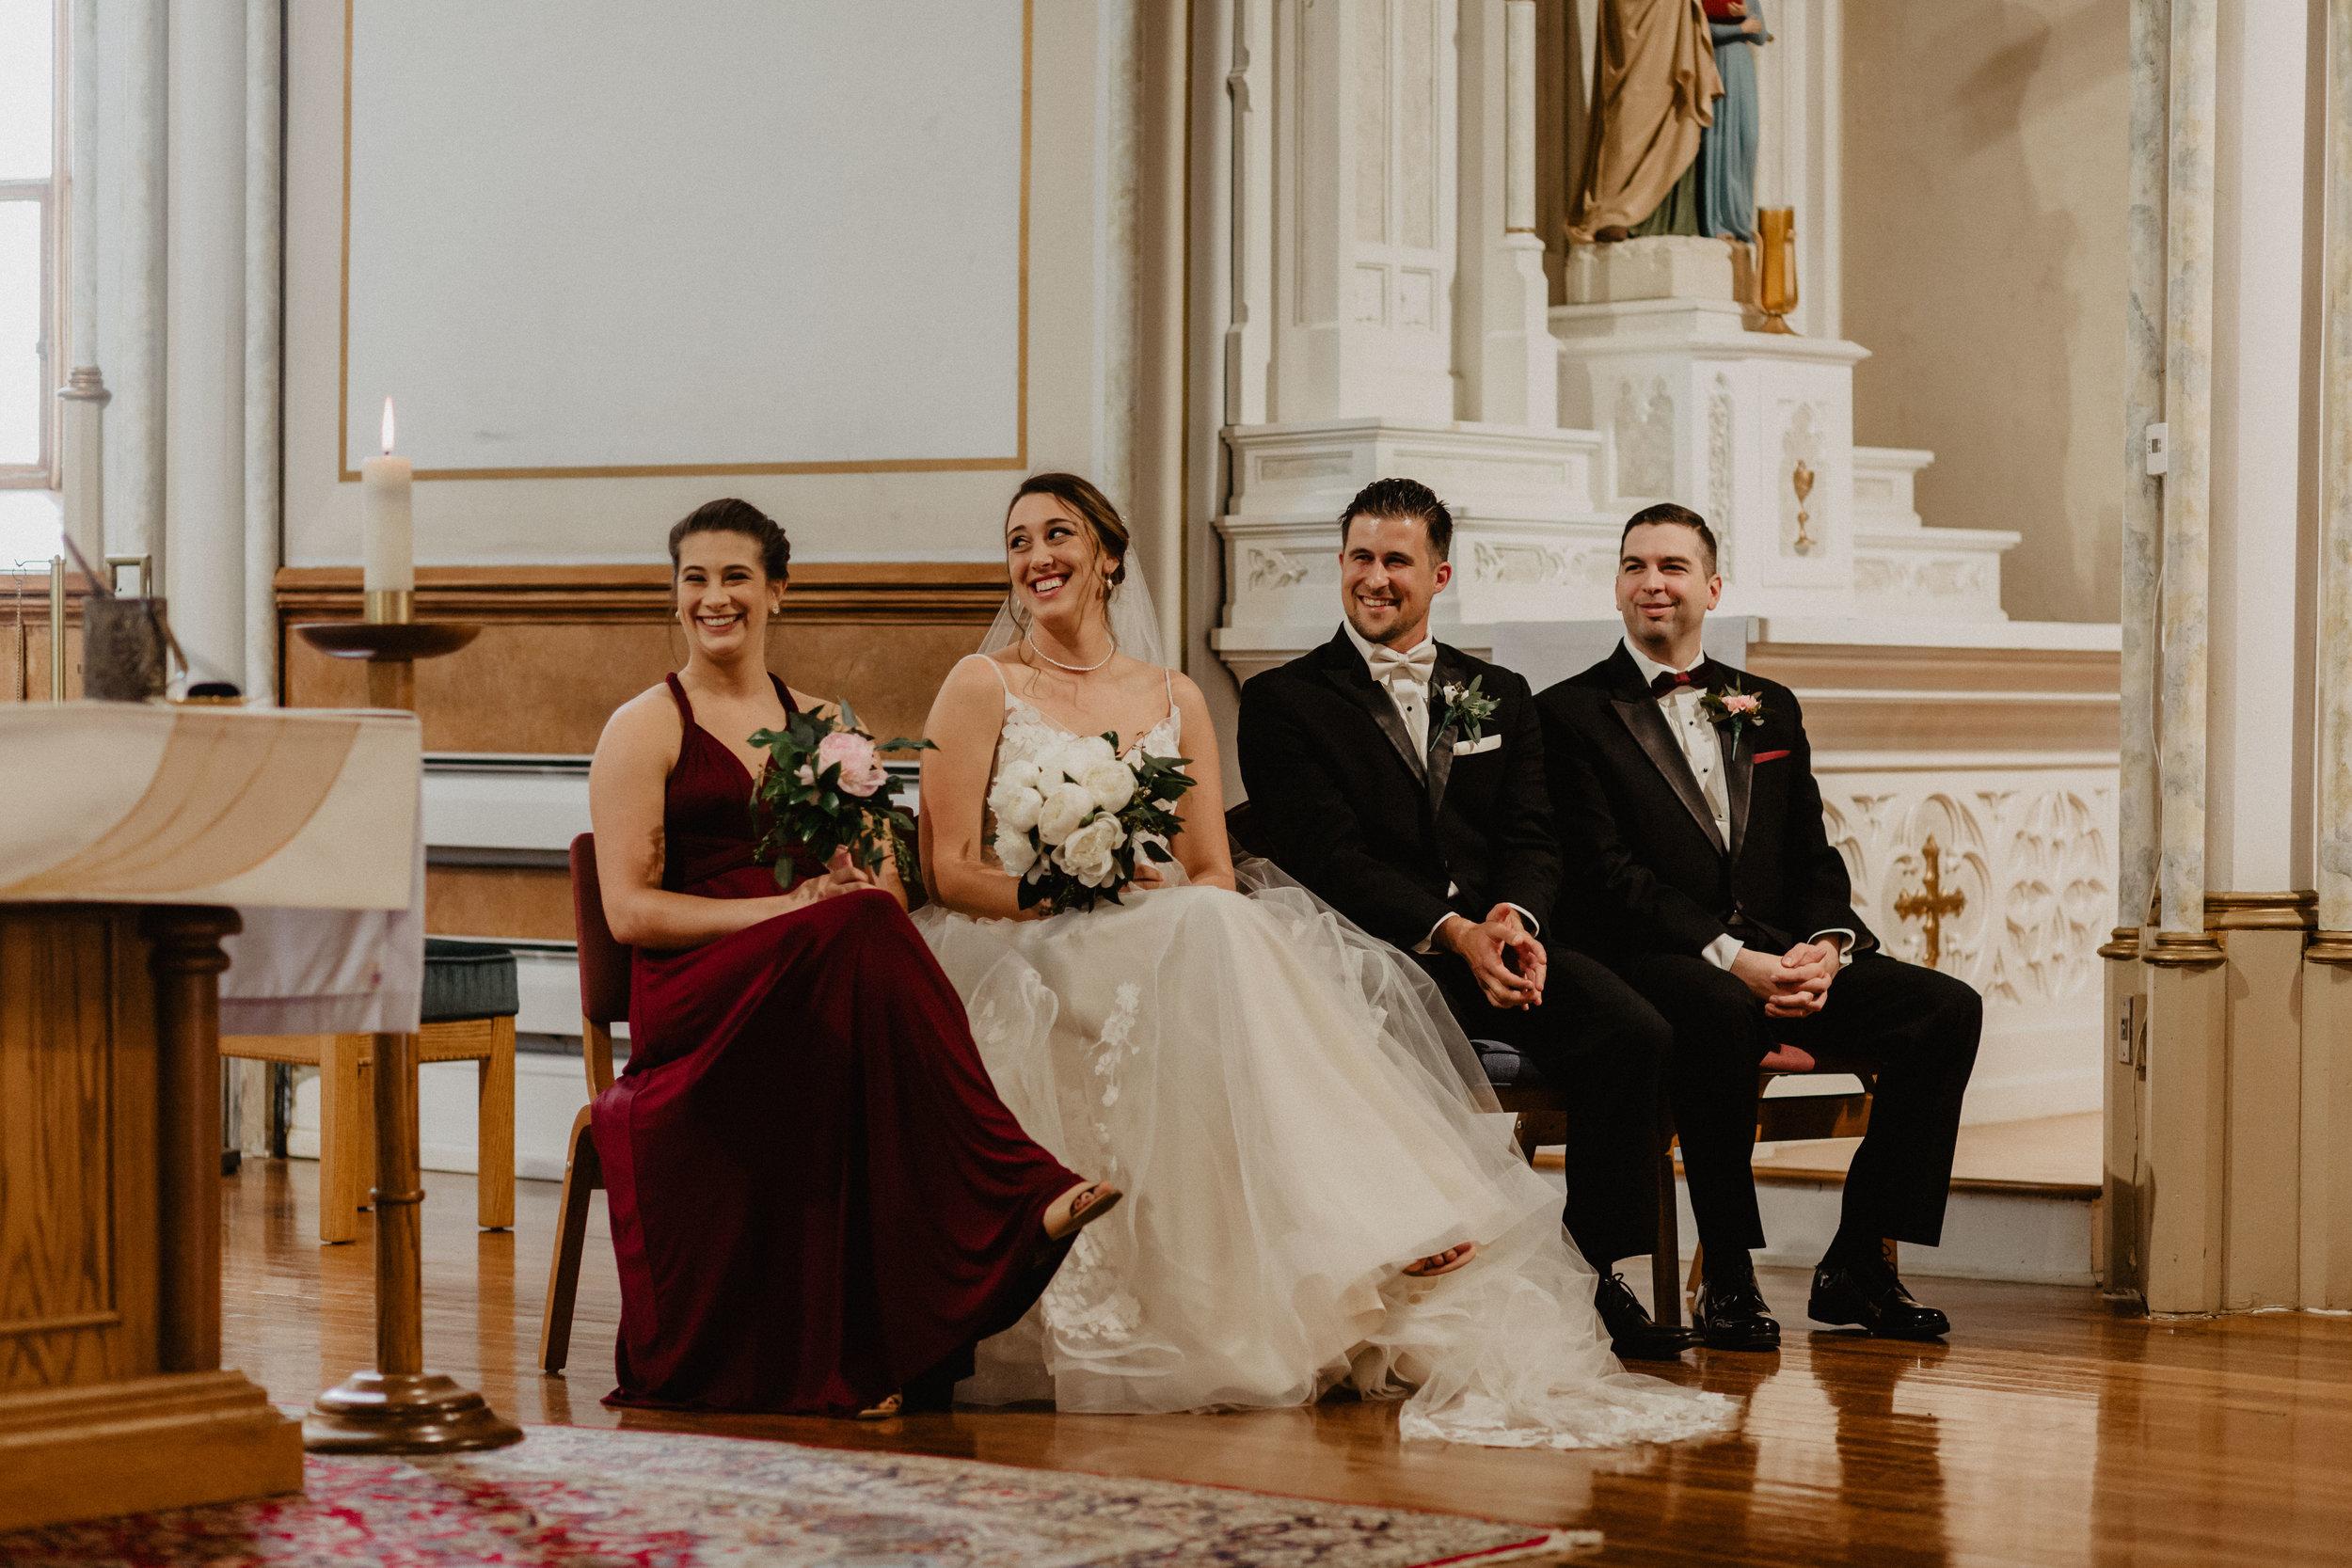 upstate_ny_wedding-24.jpg